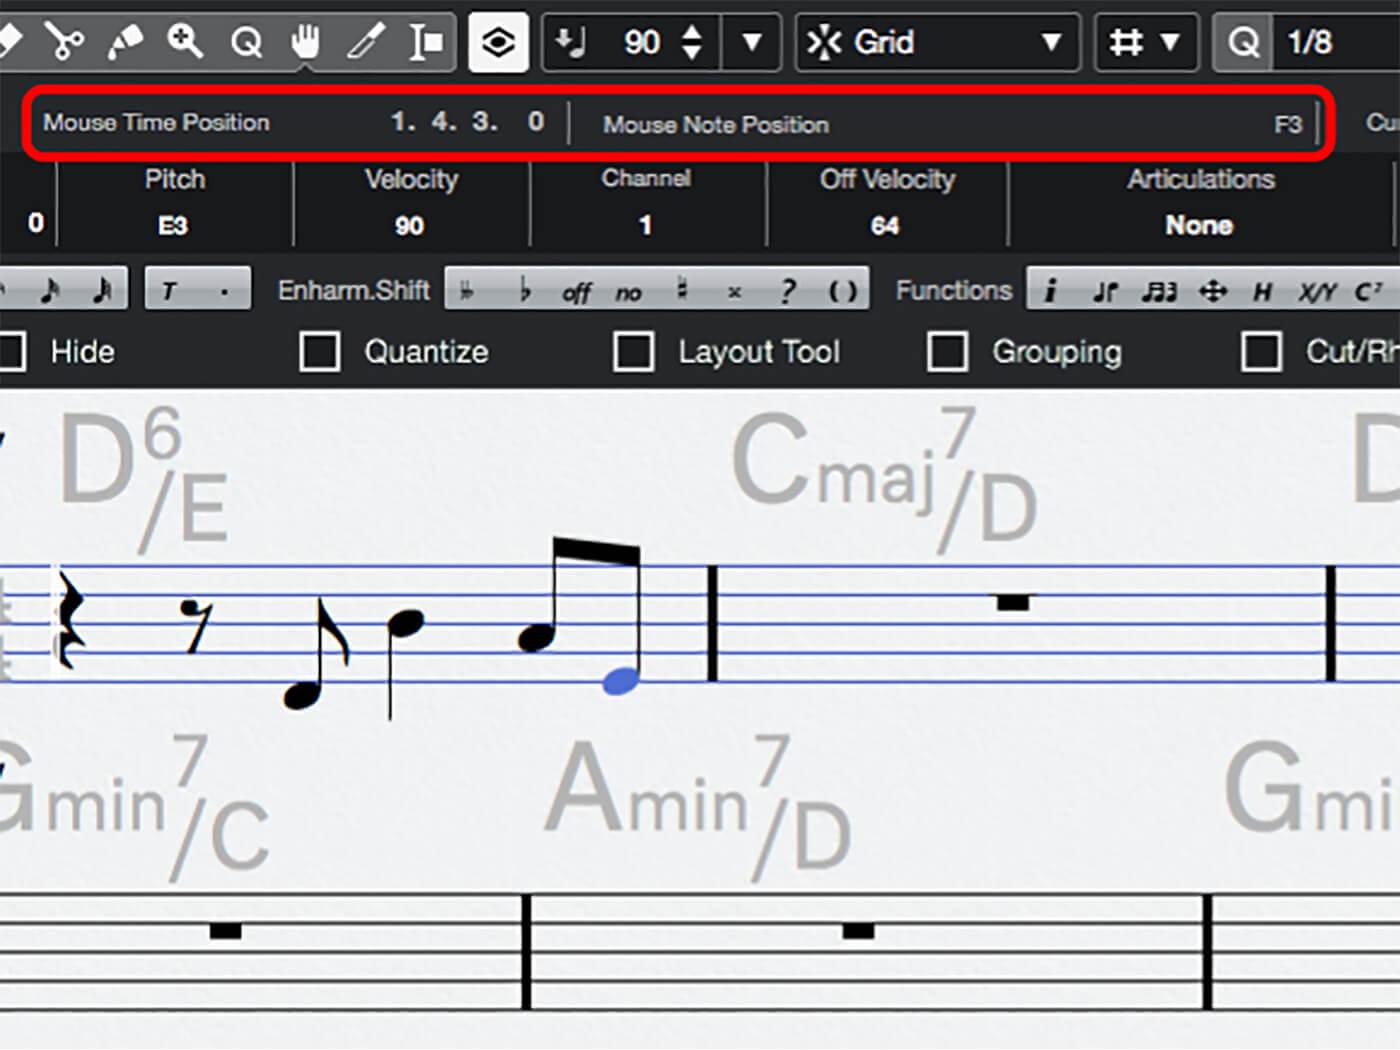 MT 205 Cubase Score Editor Step 10